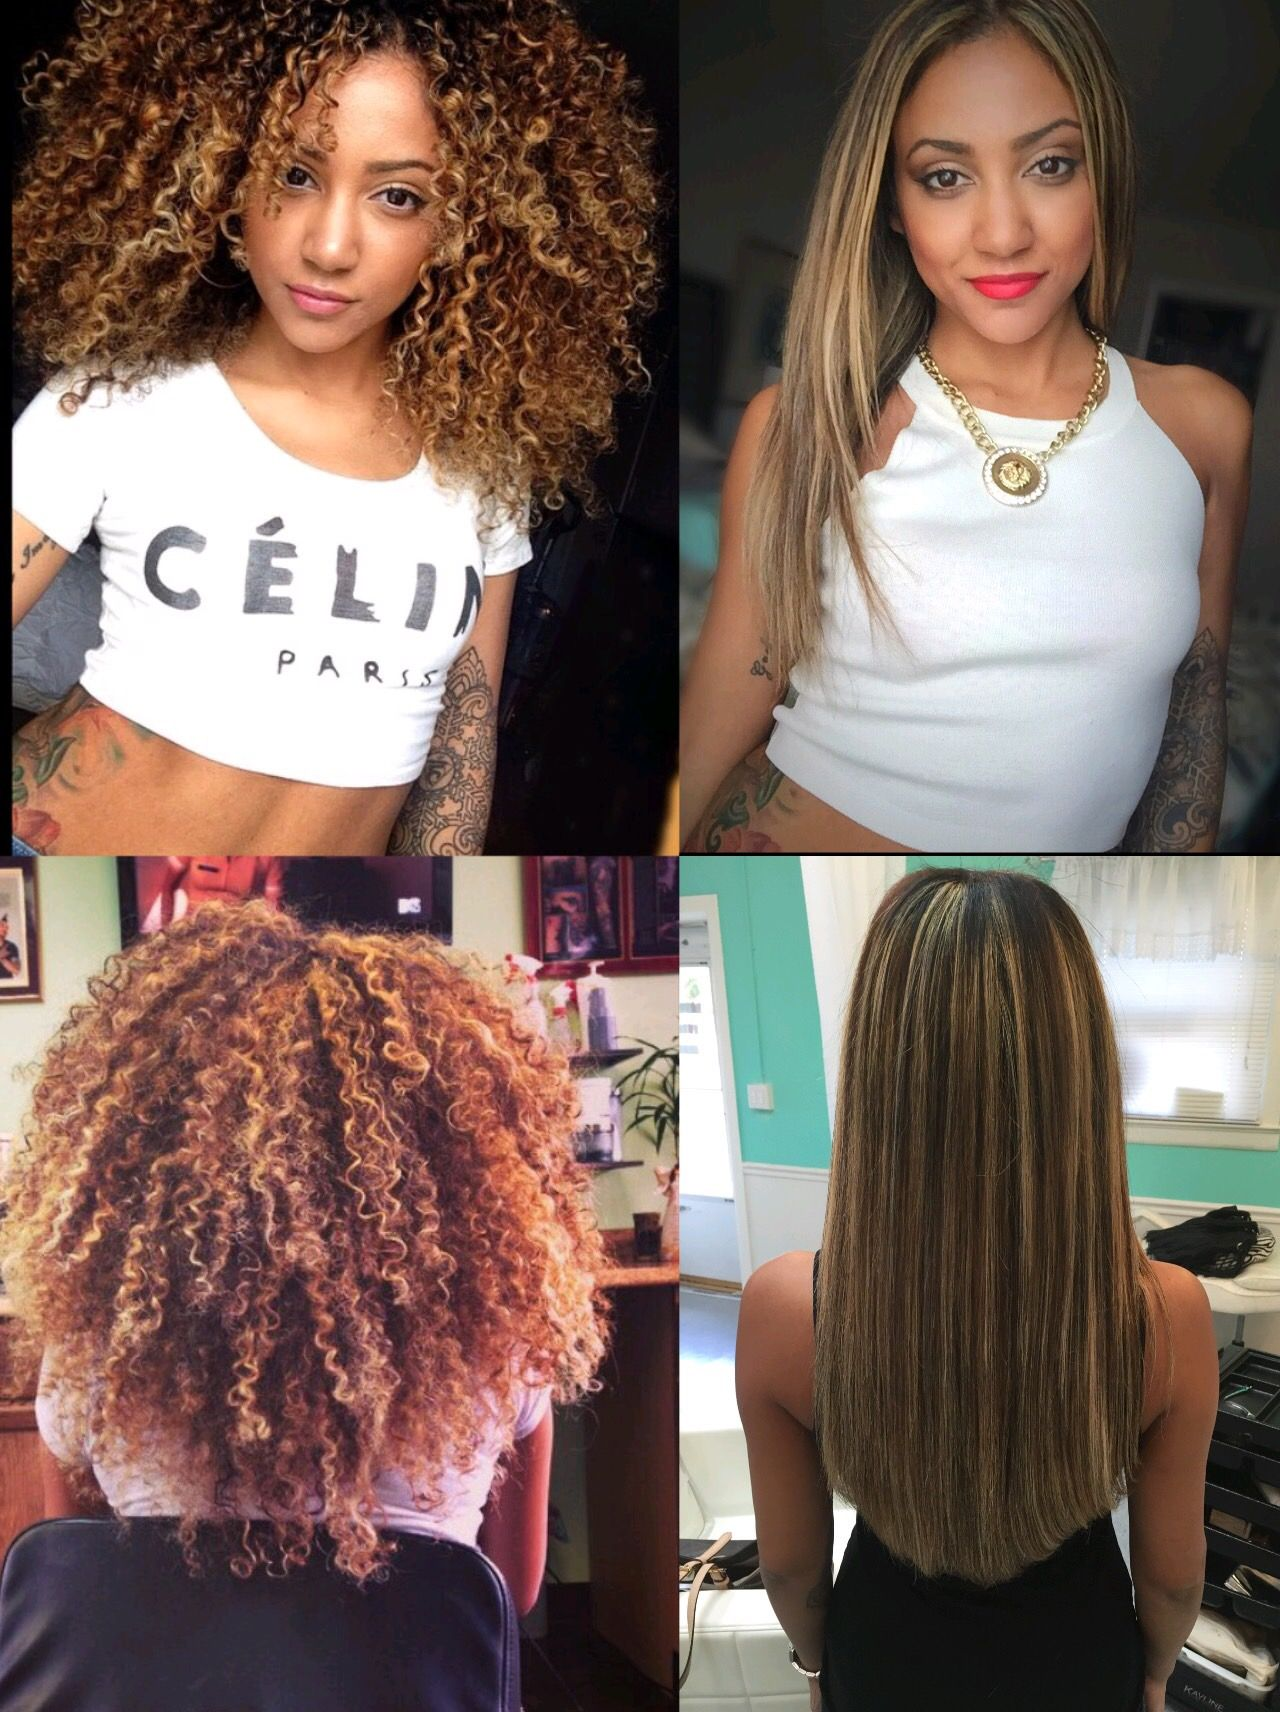 Curly Vs Straight Ig Tiffanytattooz Curly Vs Straight Hair Natural Hair Woman Curly To Straight Hair